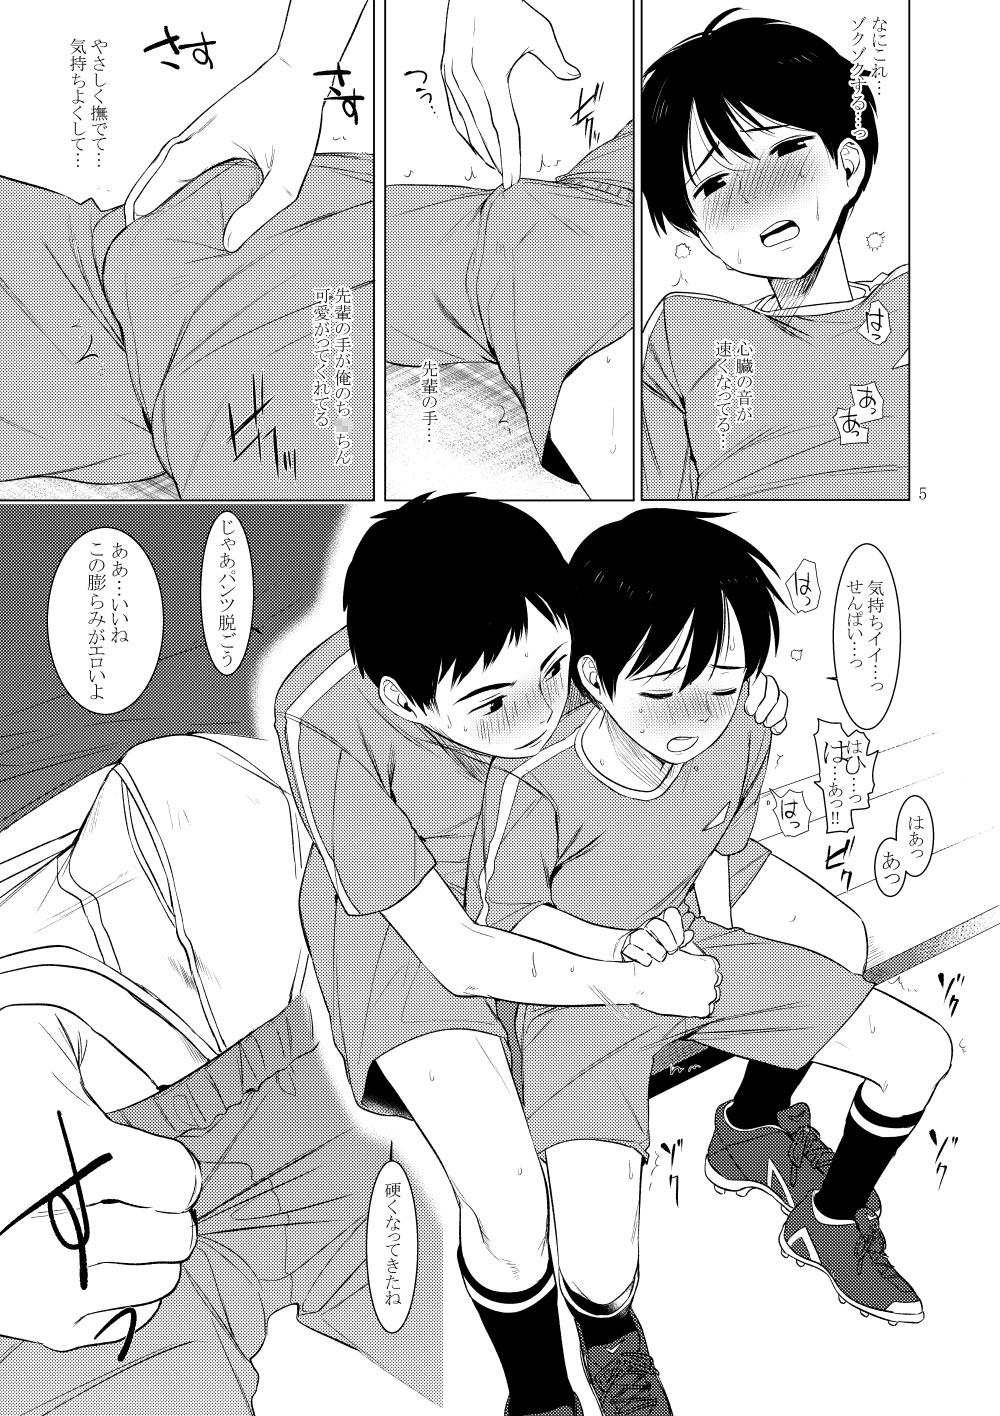 [SERVICE BOY] の【放課後卑猥特訓】